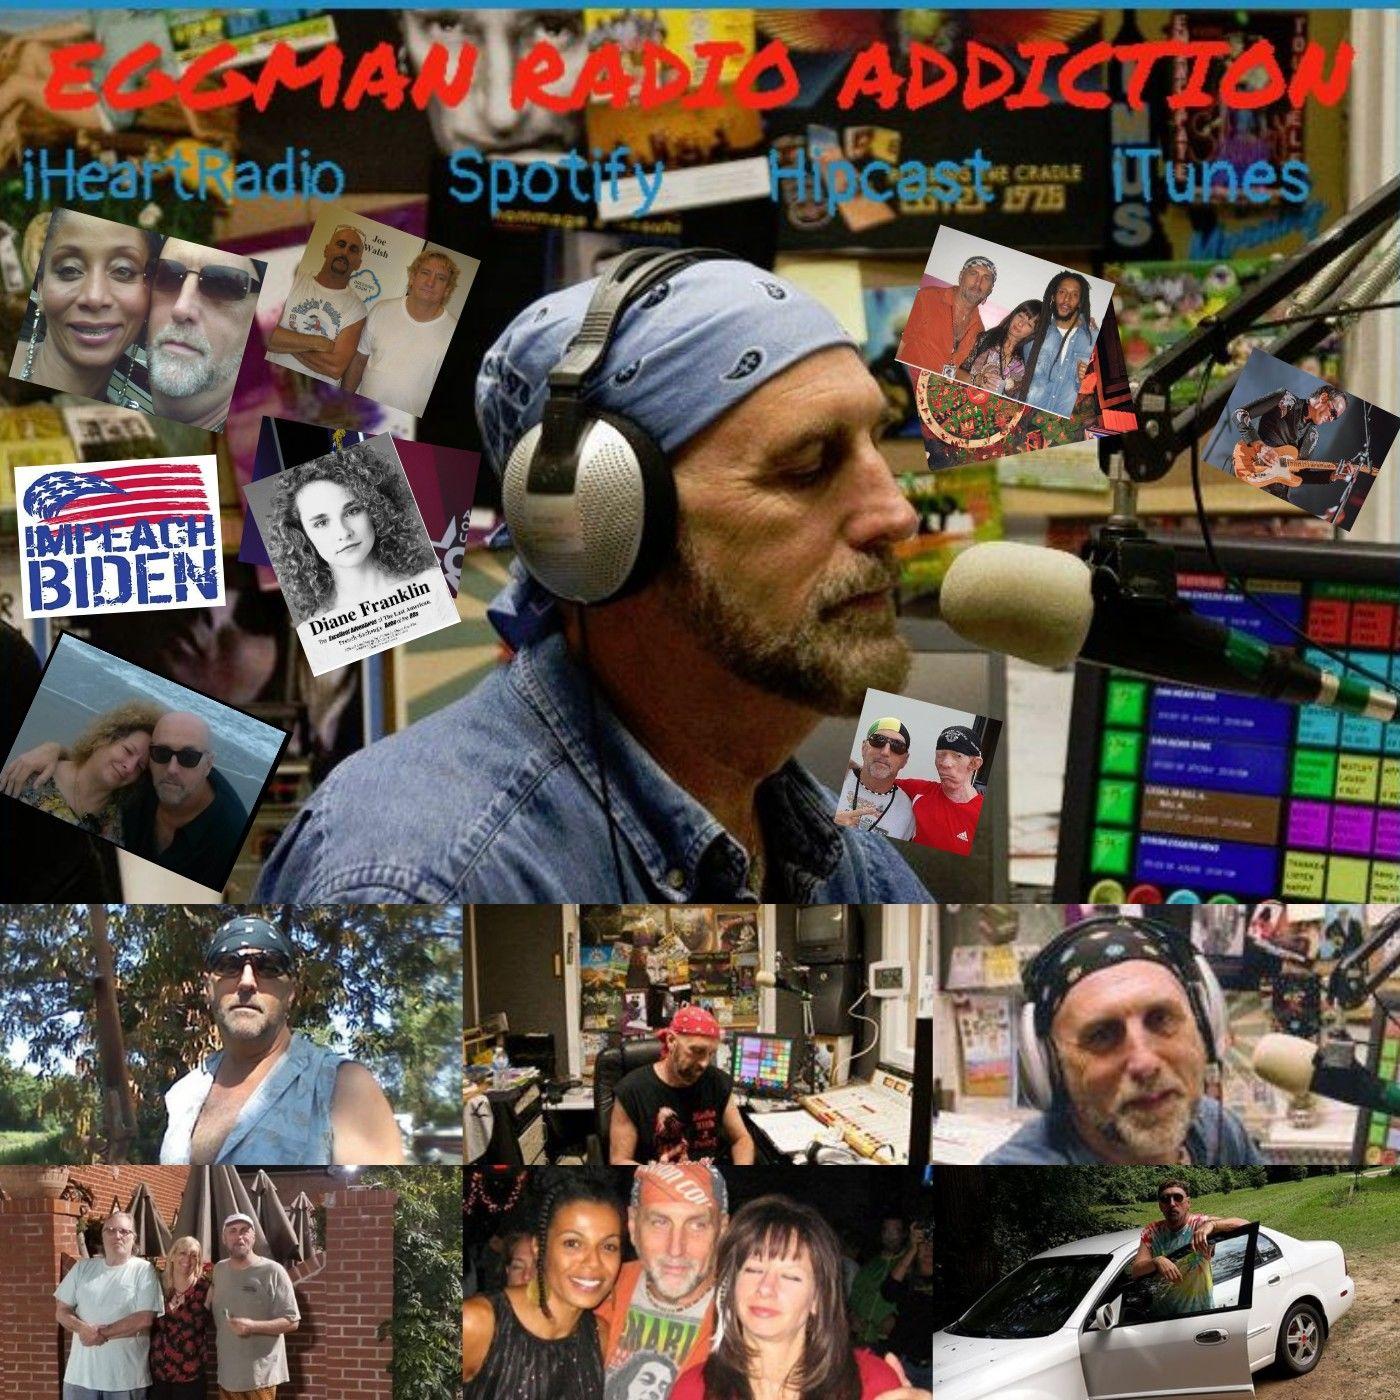 EGGMAN RADIO ADDICTION